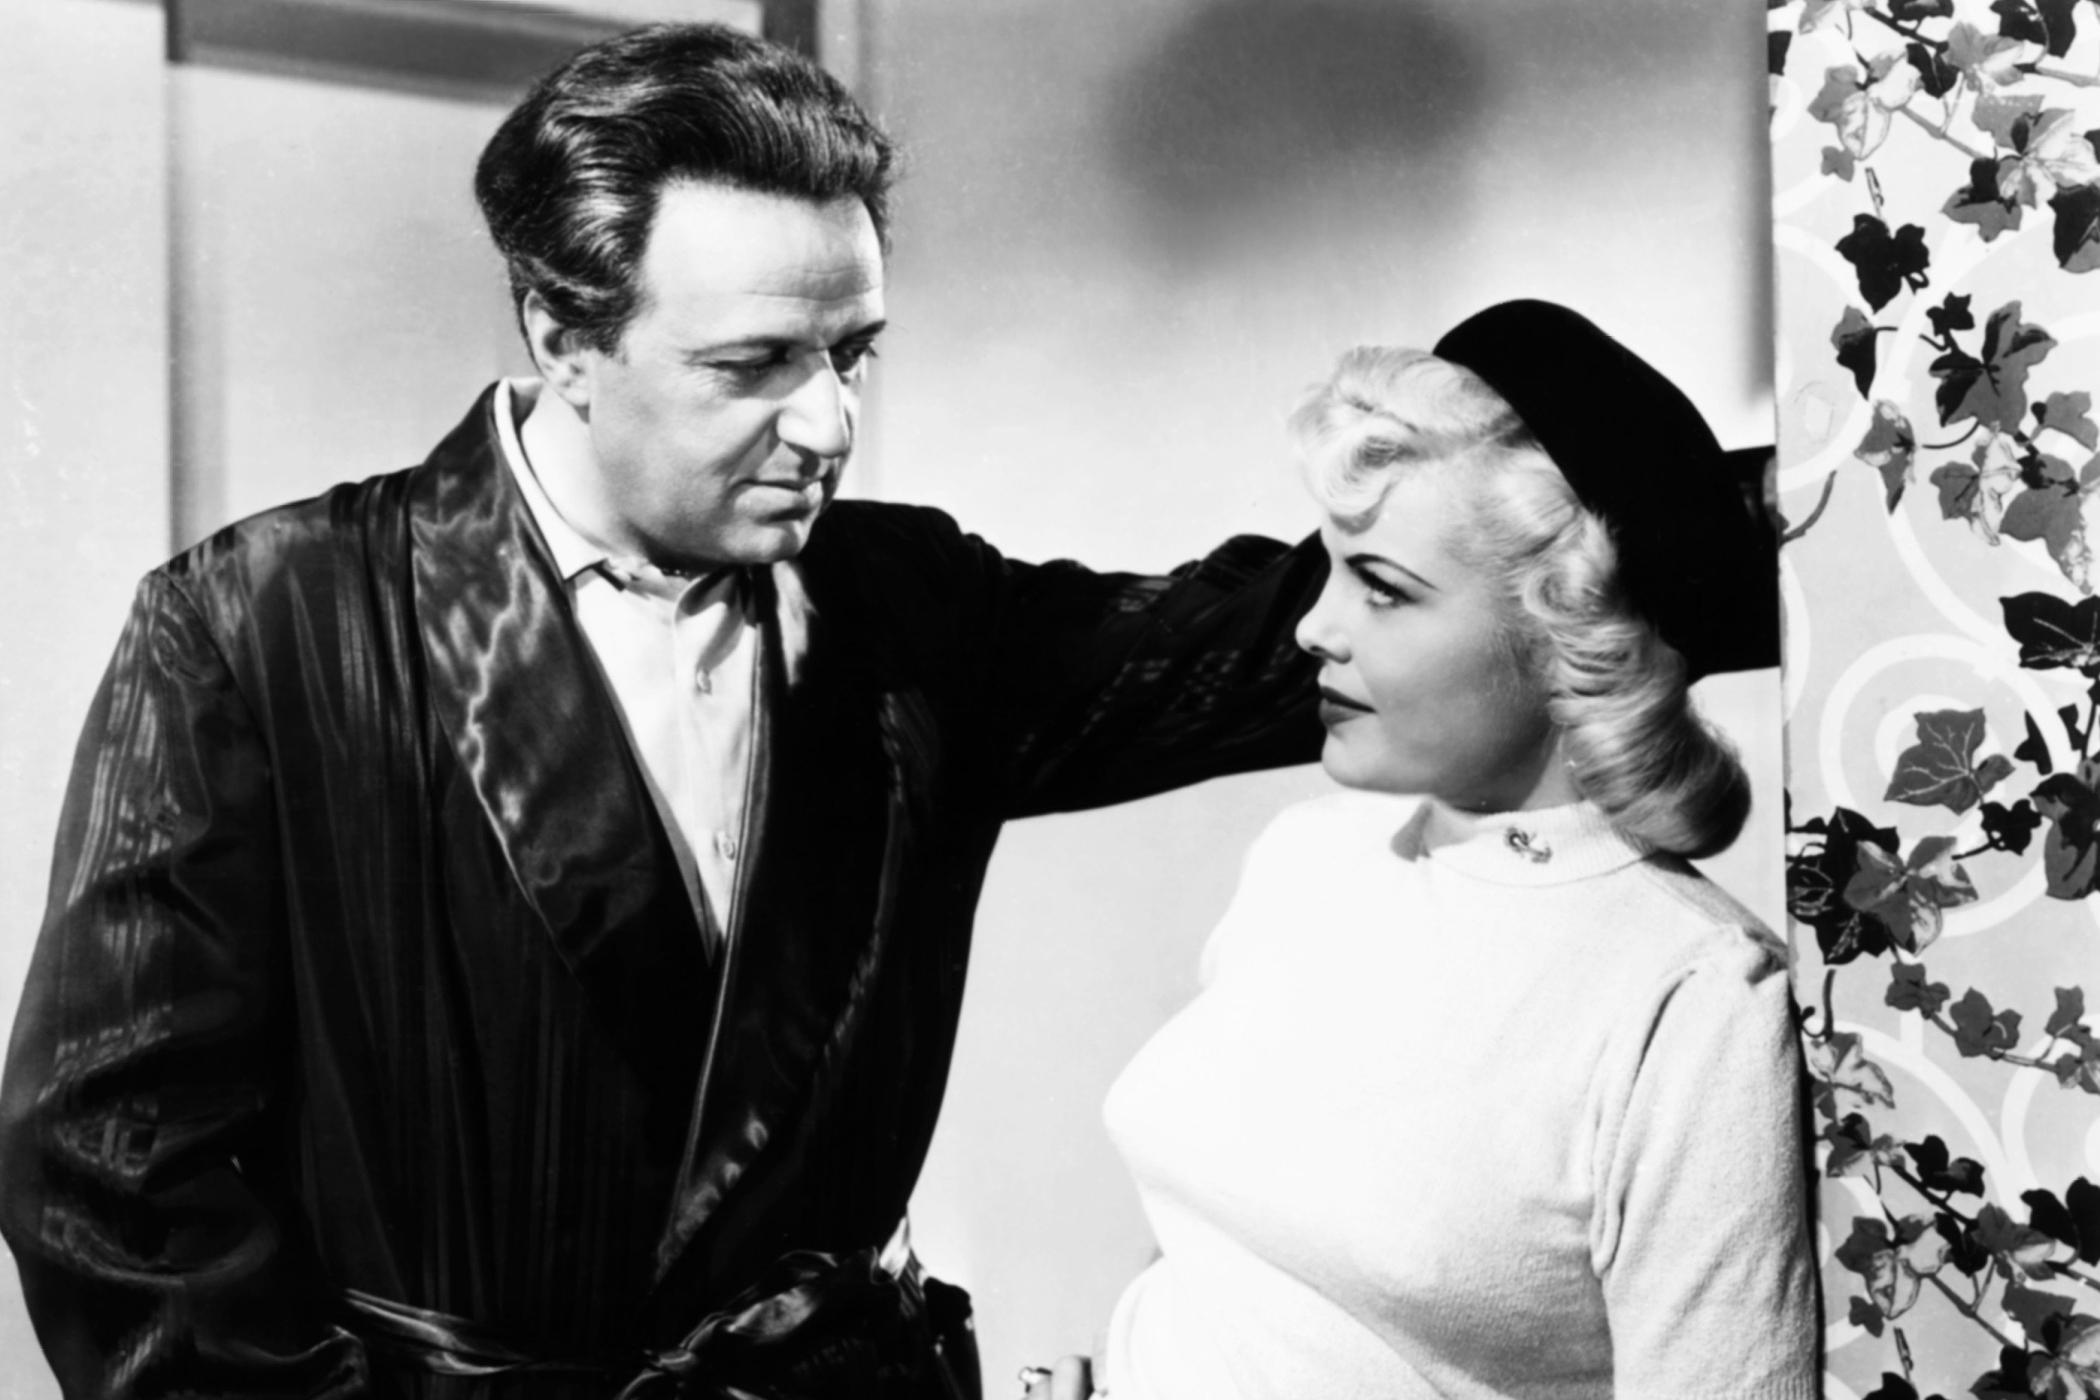 Podivné okouzlení (Strange fascination, 1952). Zleva: Hugo Haas, Cleo Moore